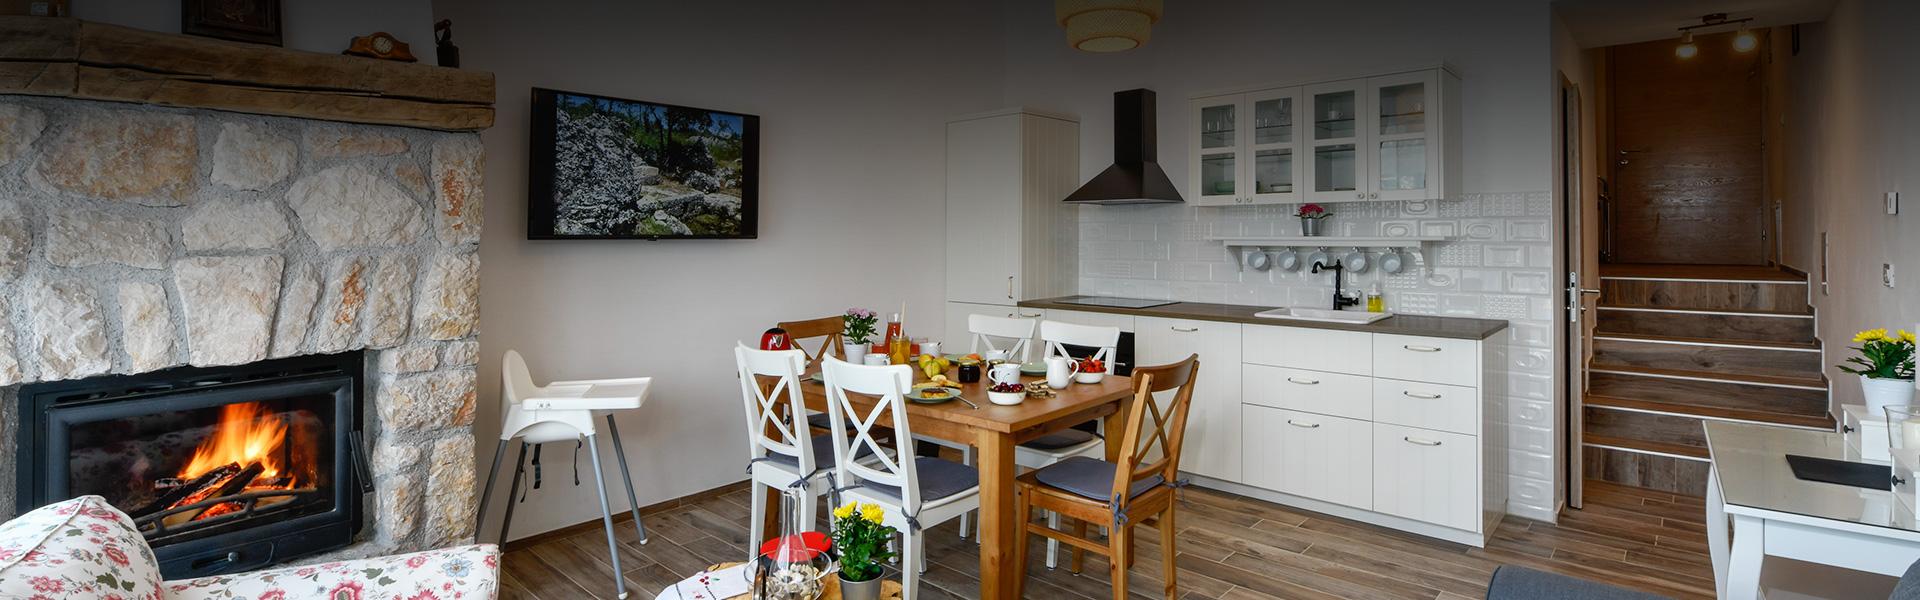 Exclusive Villas Joja - Joja House - Living-Room